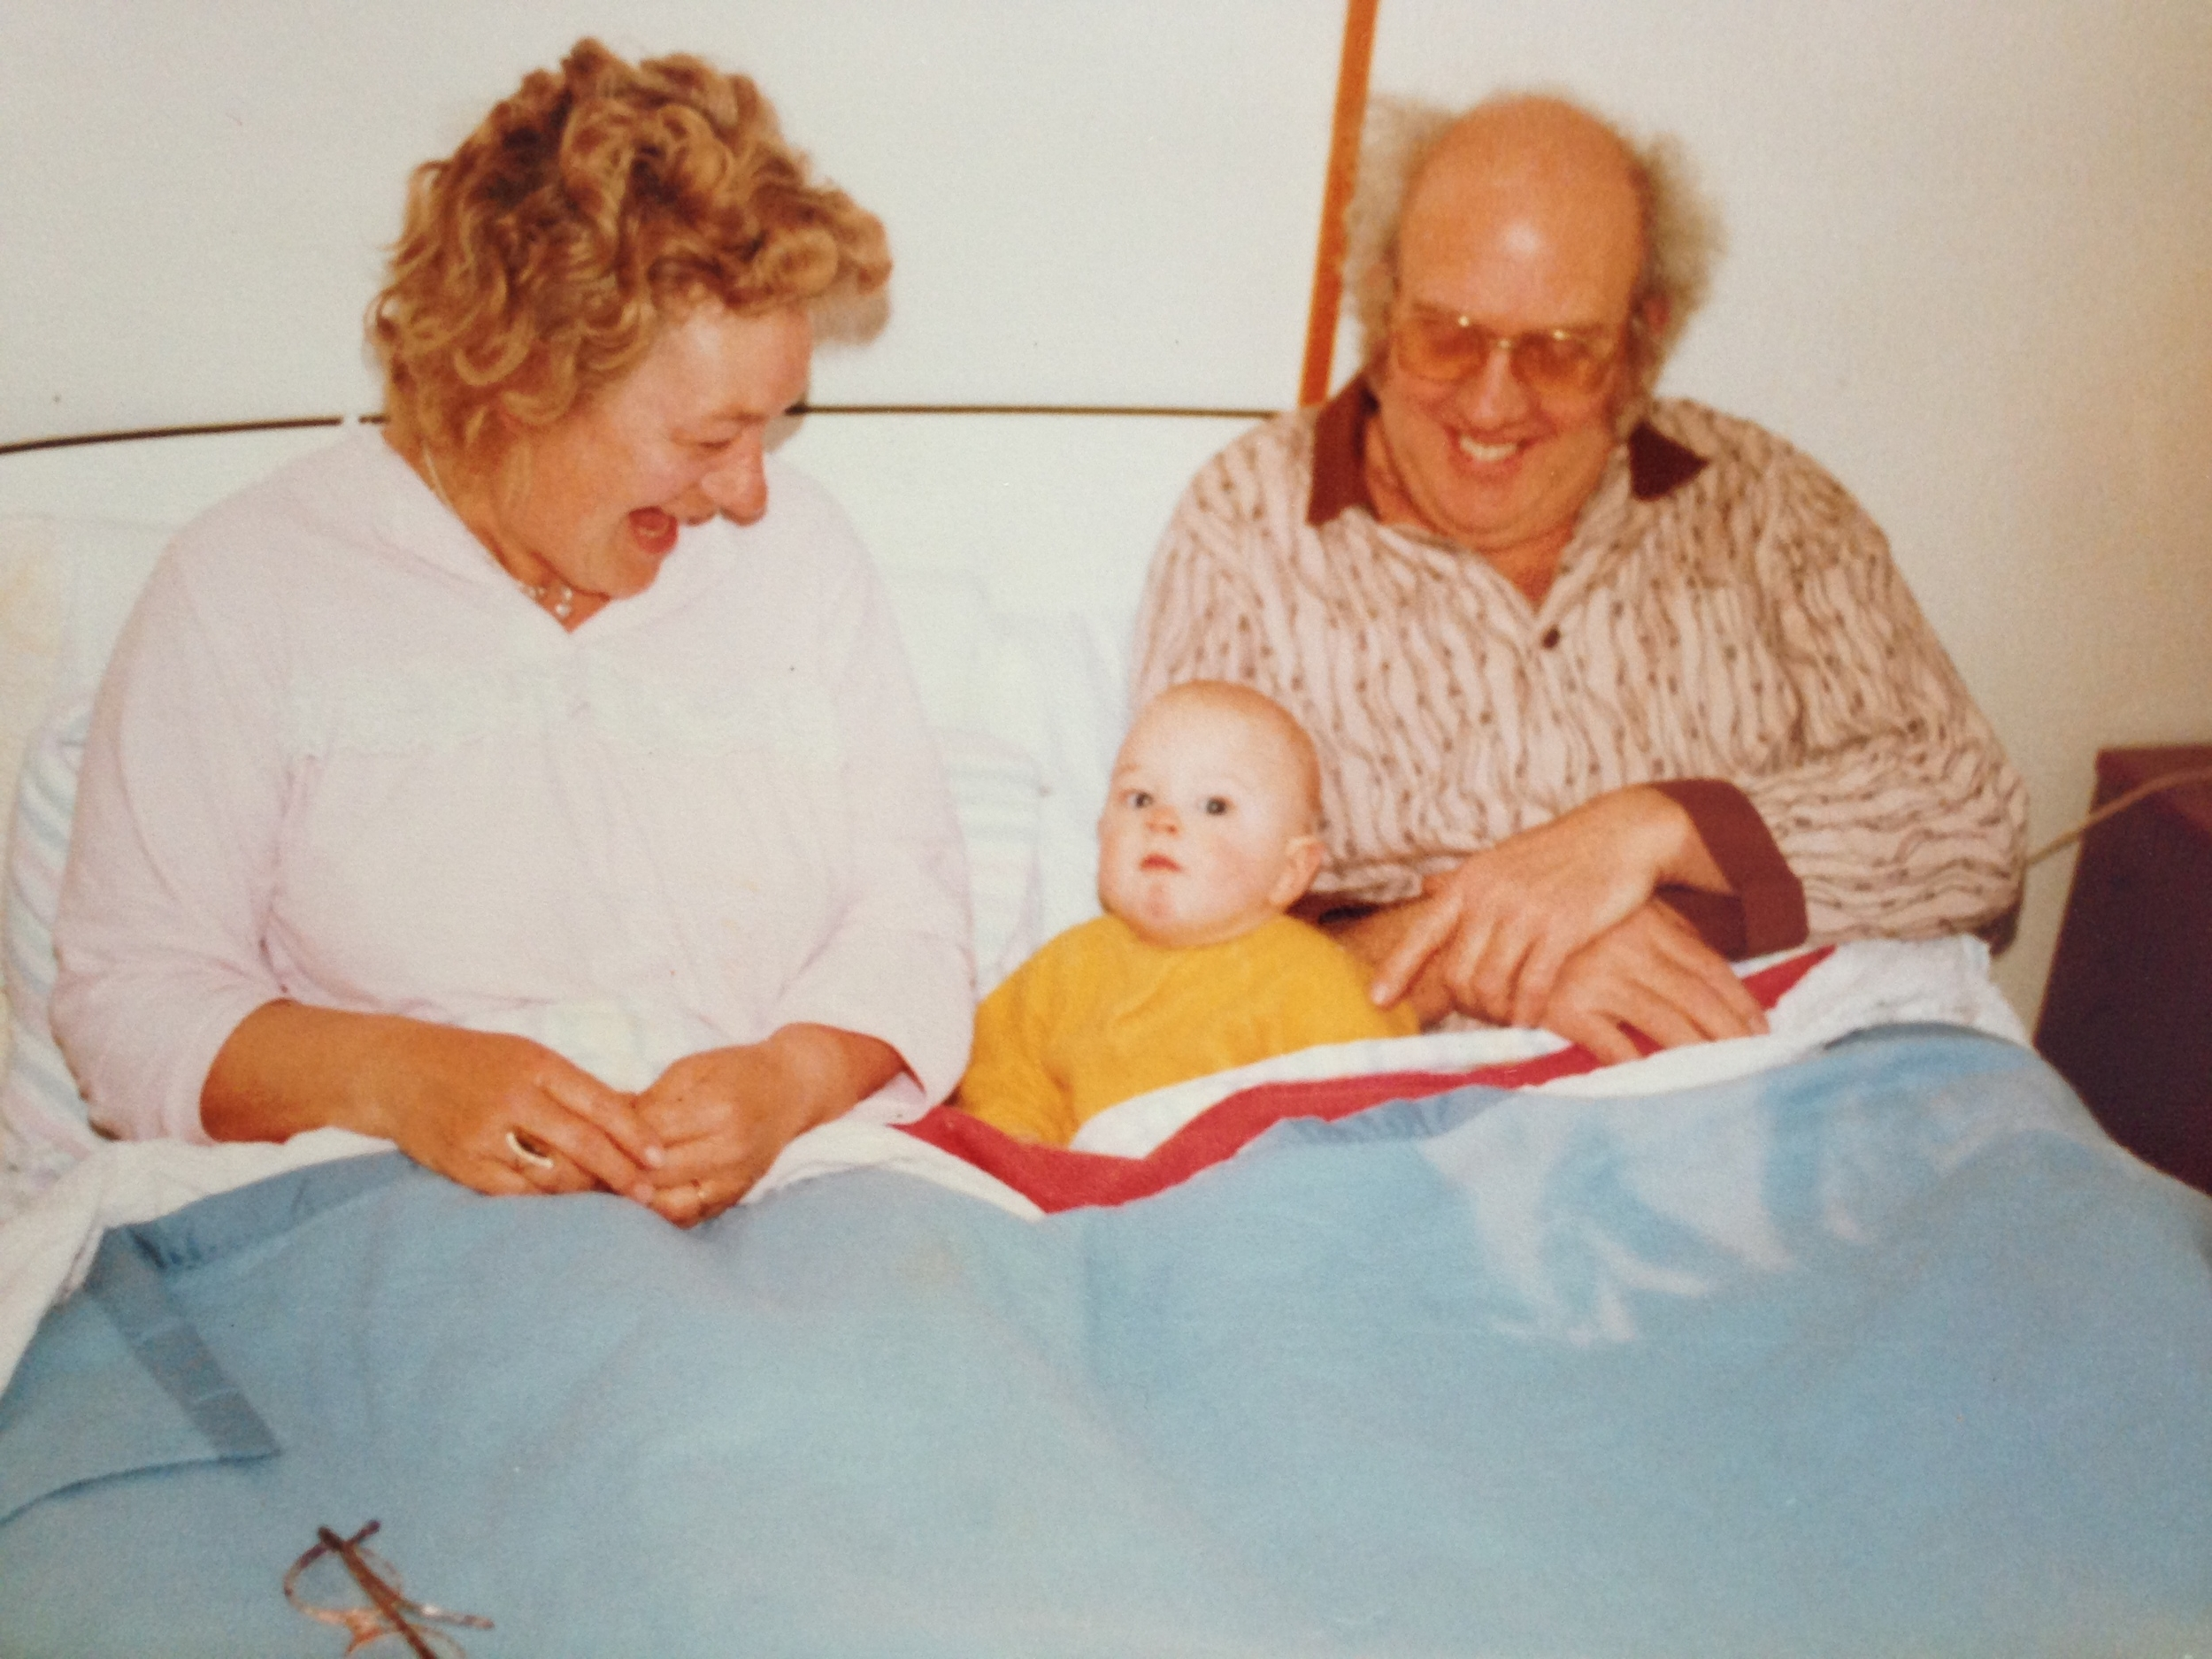 Self-portrait with Grandparents. Abersoch, c.1980.